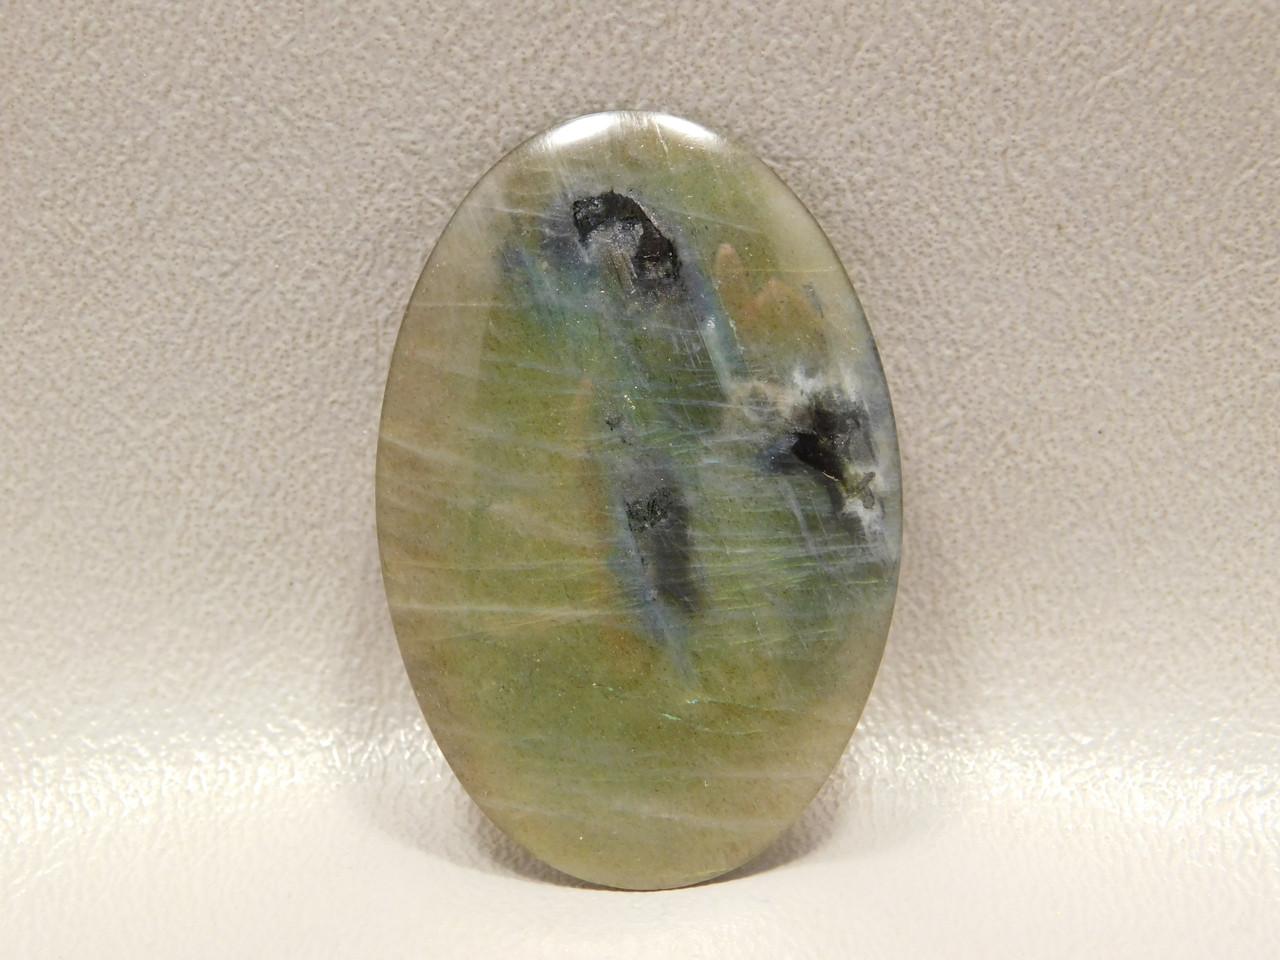 Spectrolite Designer Cabochon Oval Flashy Yellow Chatoyant Stone #8